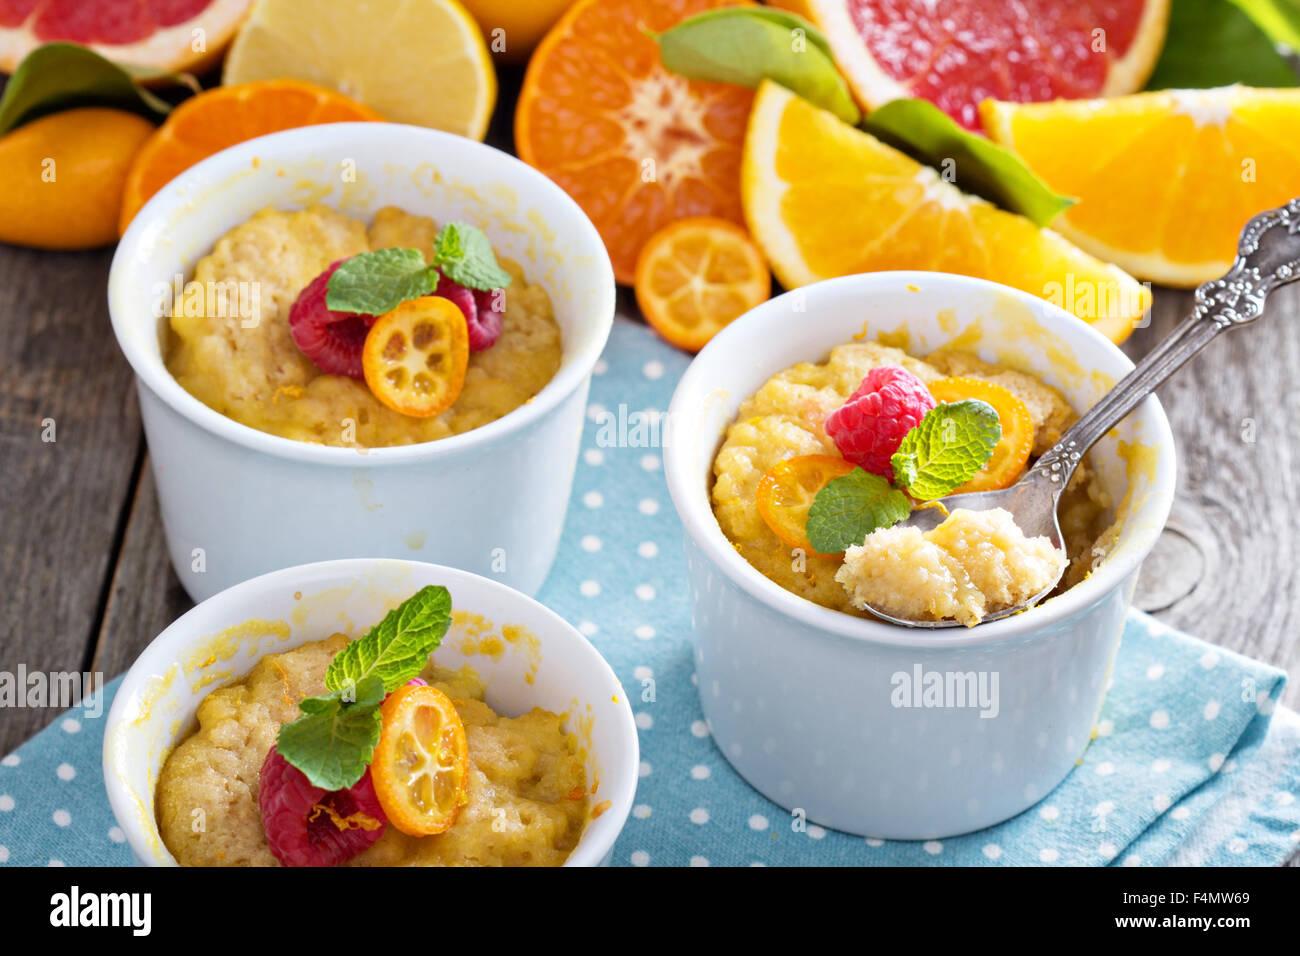 Citrus pudding in white ramekins with oranges, grapefruit, kumquats and raspberries - Stock Image